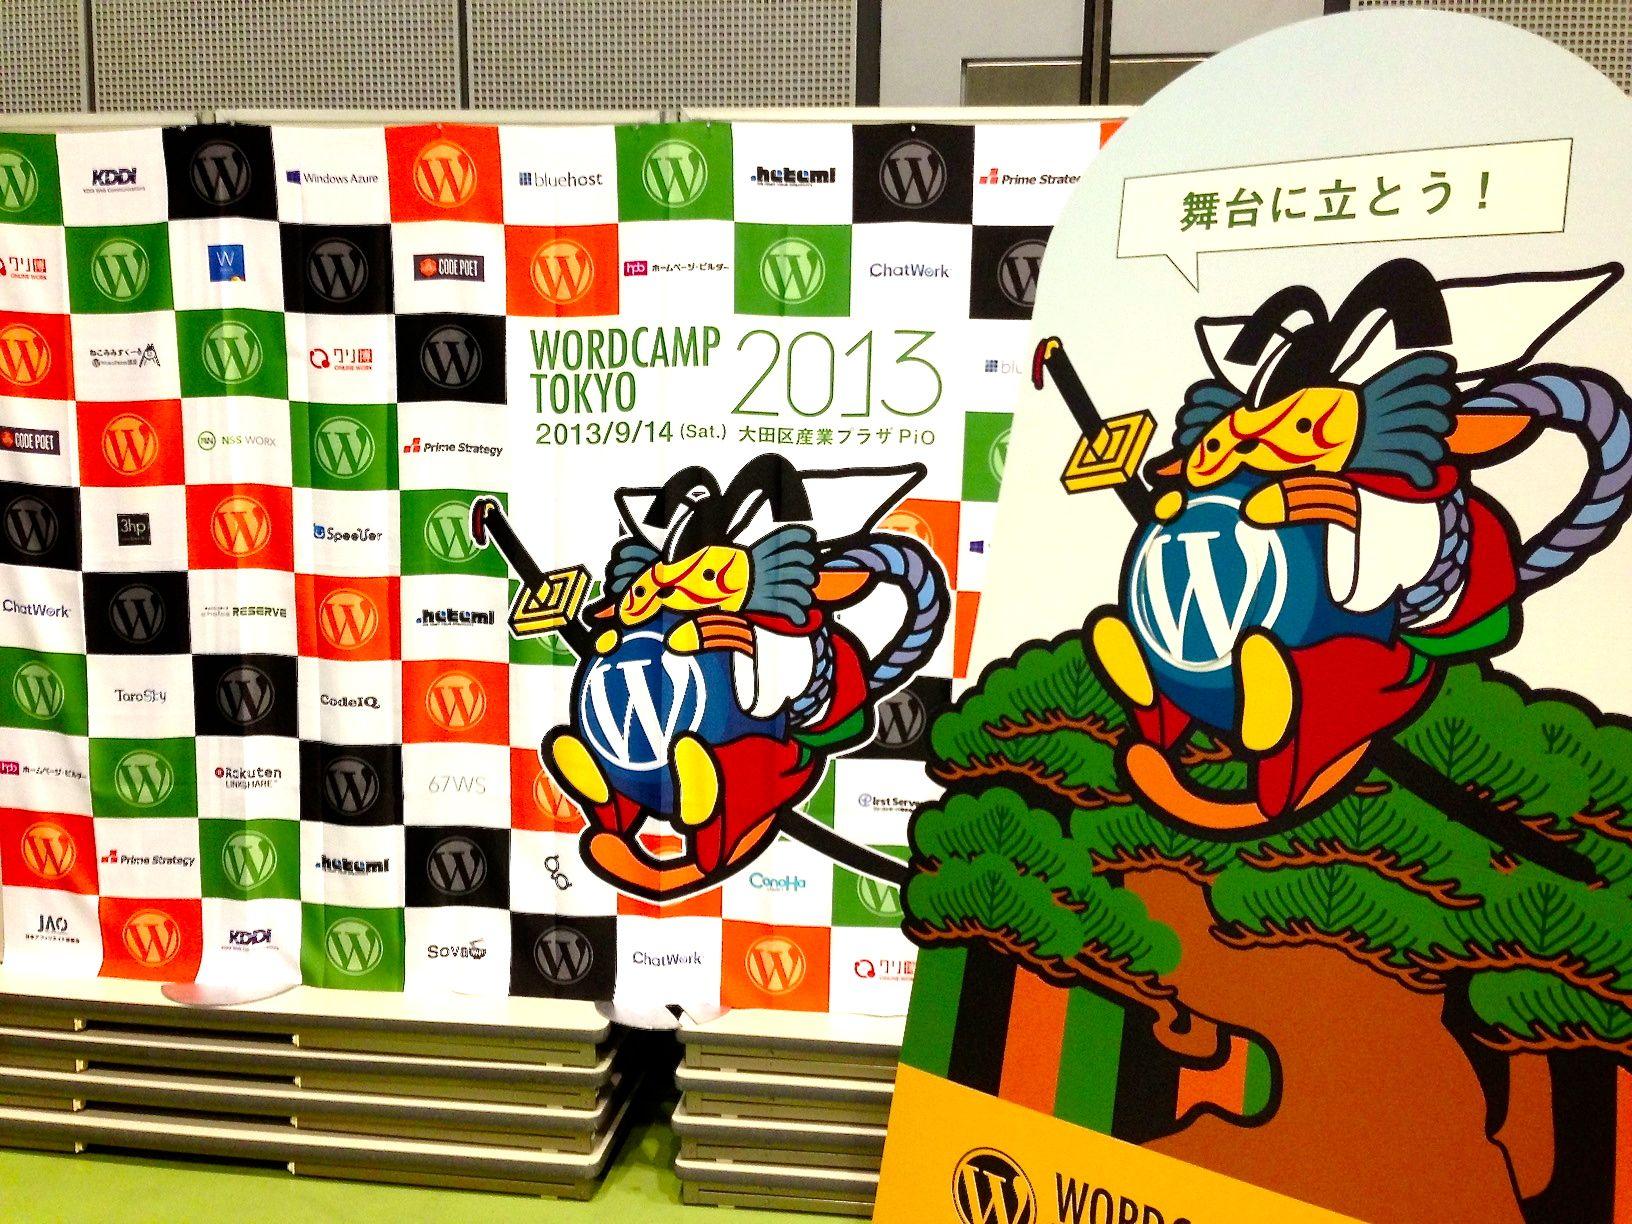 PHPカンファレンス & WordCamp Tokyo 2013に参加。ブロガー、エンジニアはもっとイベントに参加しよう!